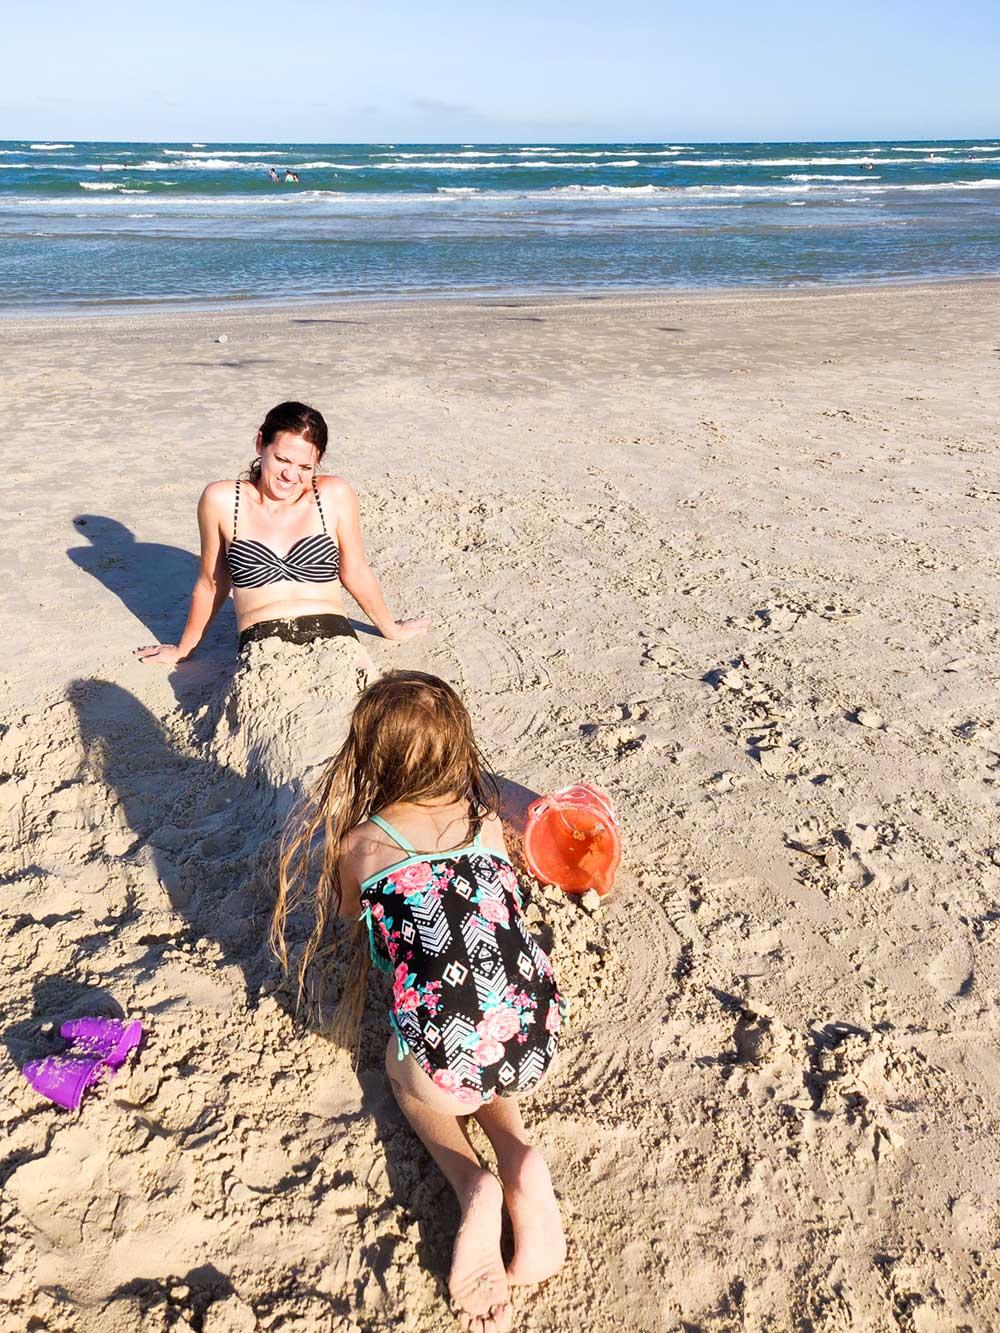 Corpus christi beach mermaids